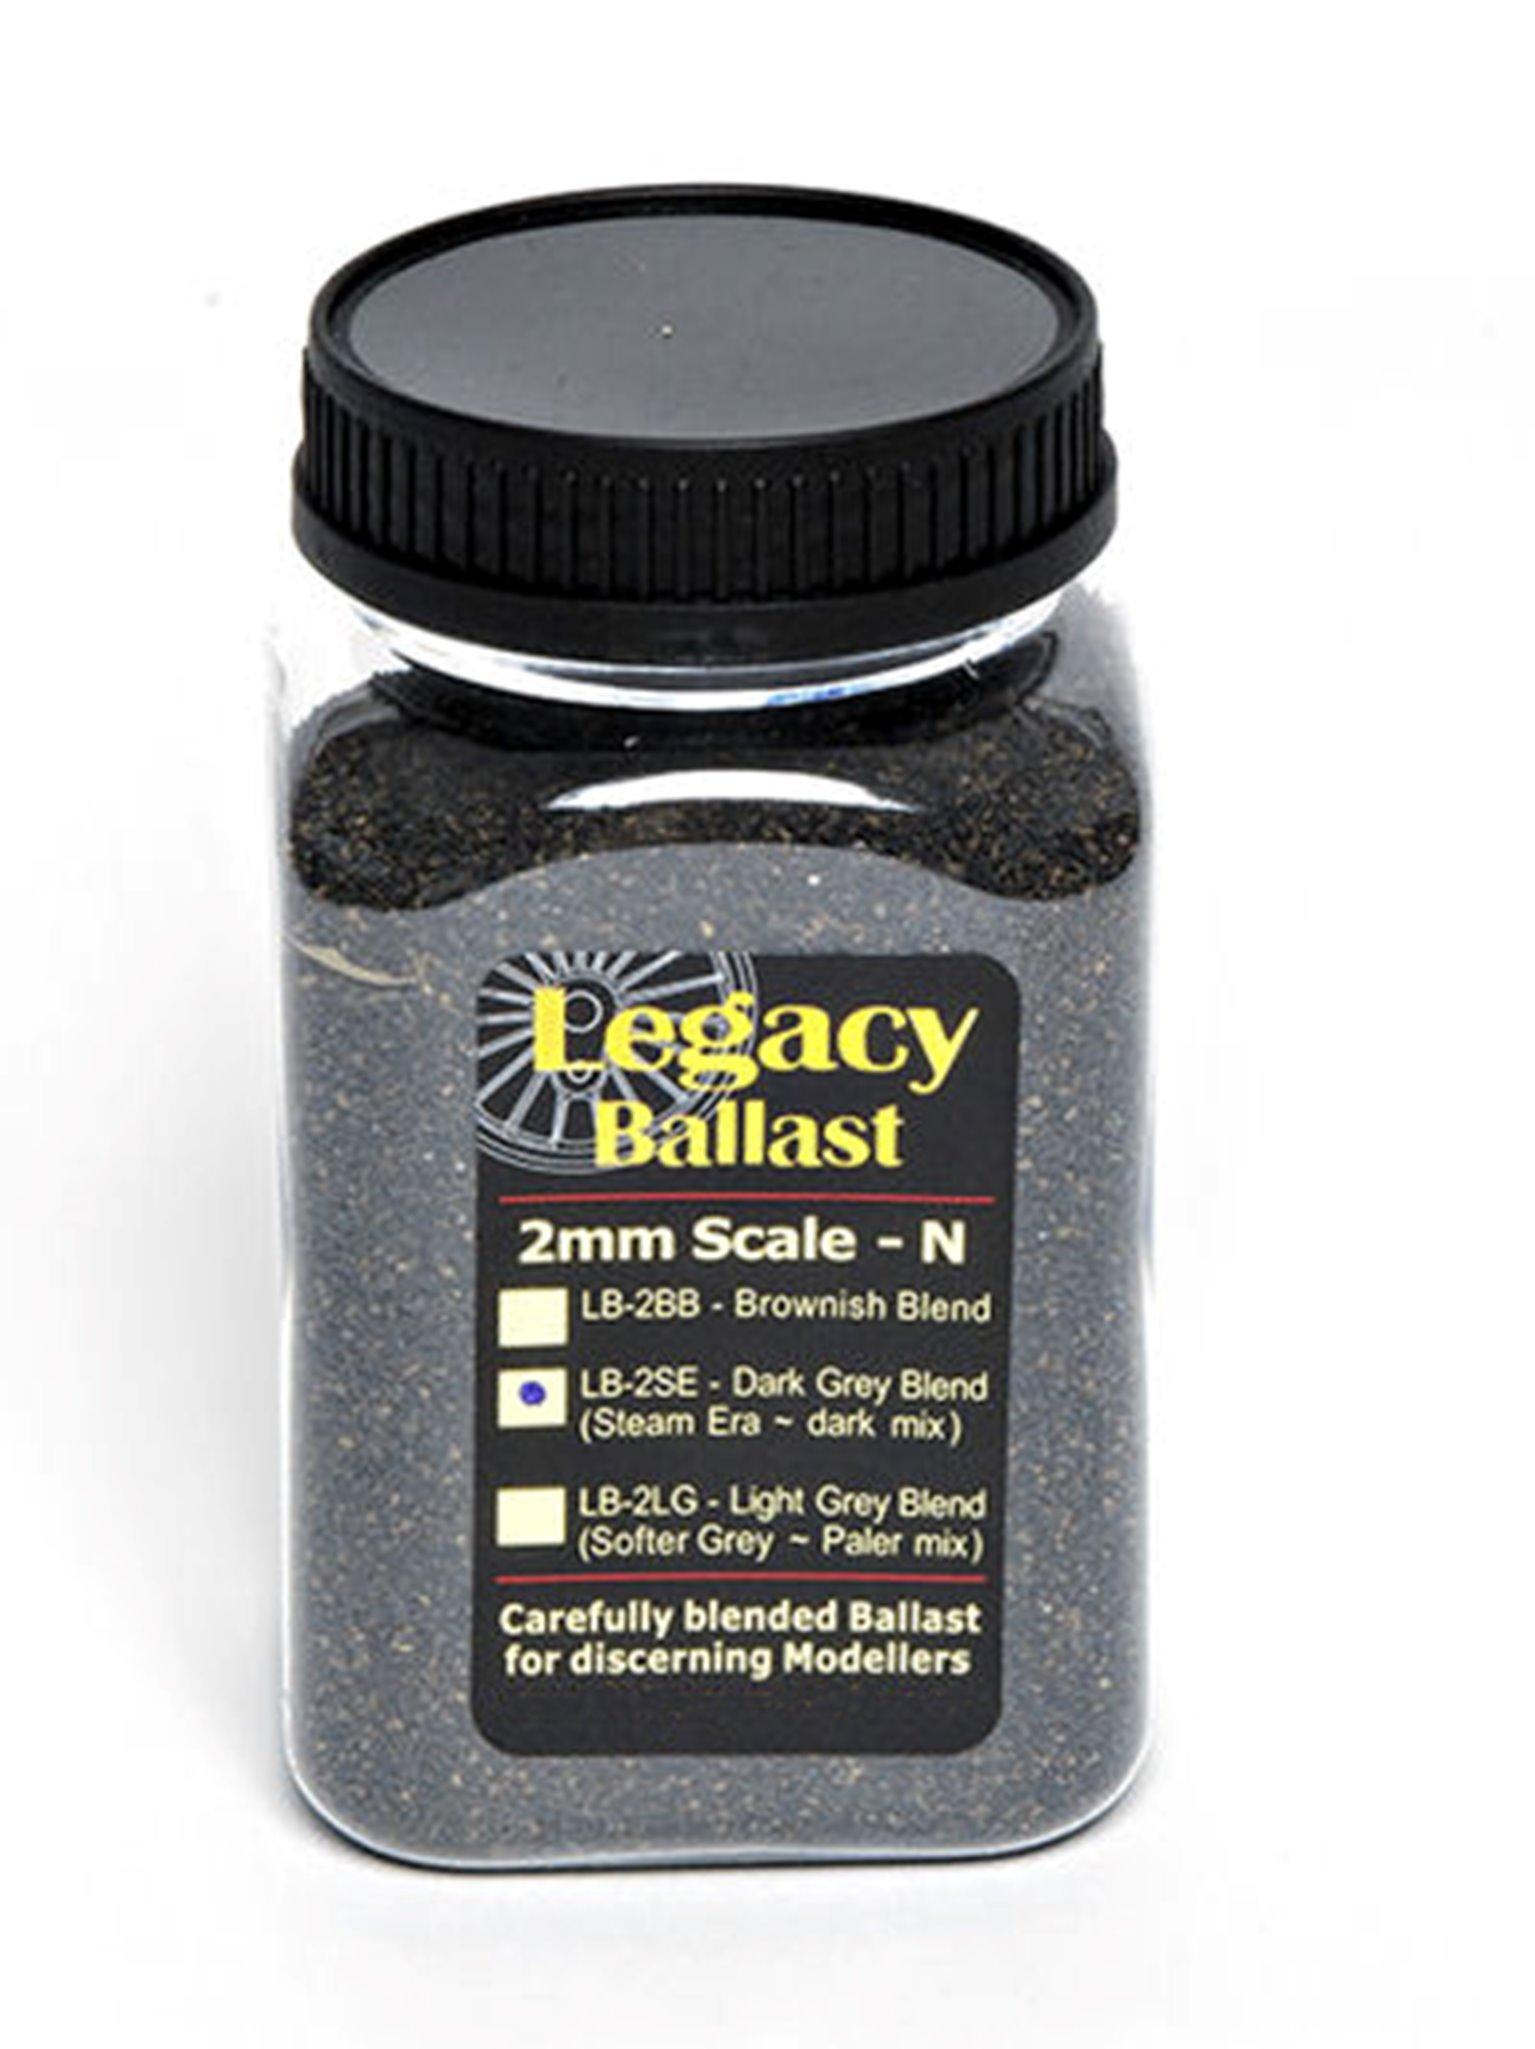 2mm/N scale Ballast – Shed or Steam Era